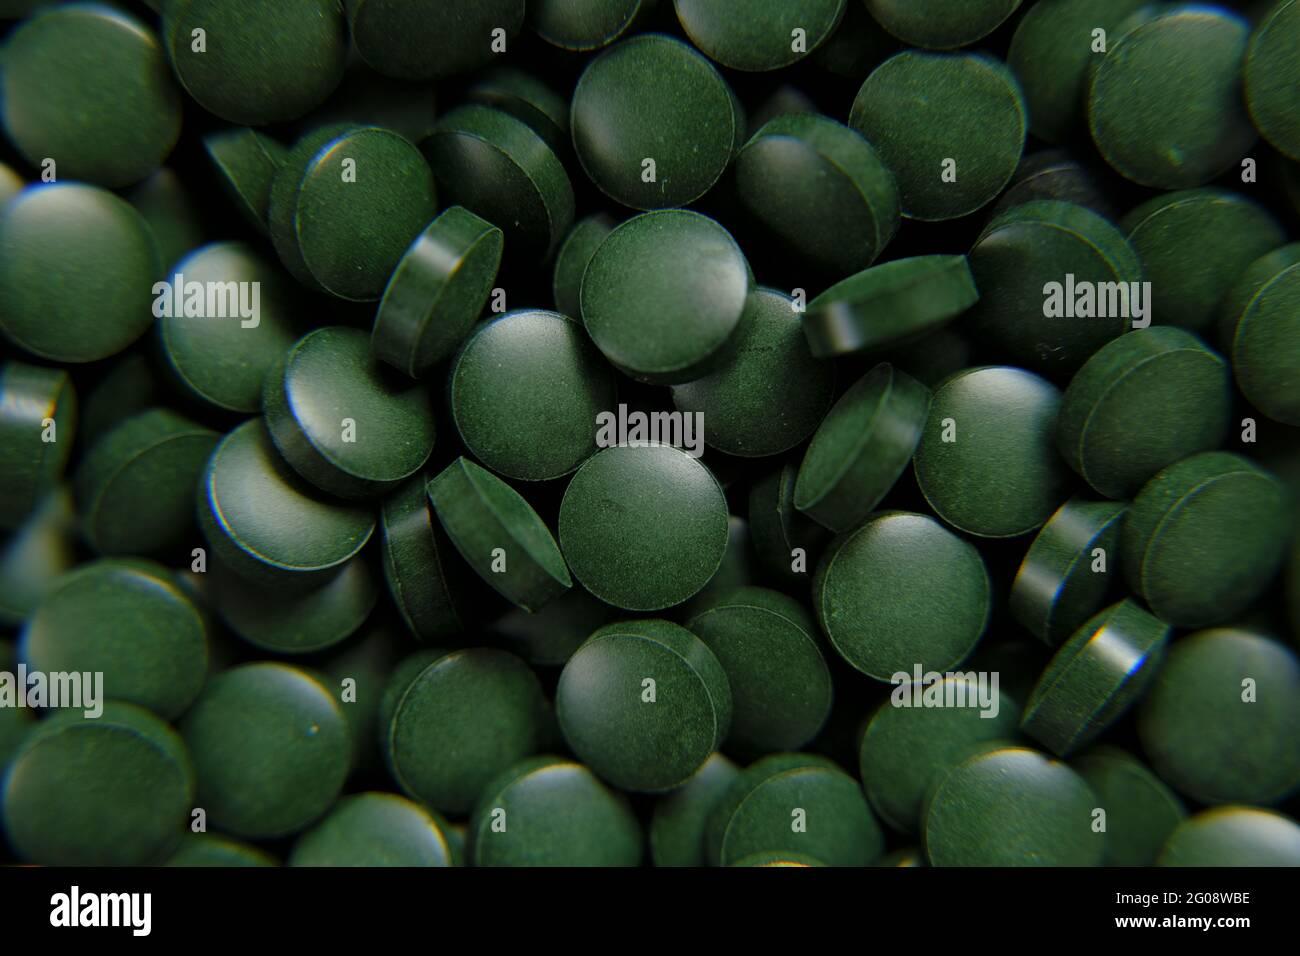 Spiruline vert pilules fond. Comprimés verts d'algues Spirulina. Banque D'Images